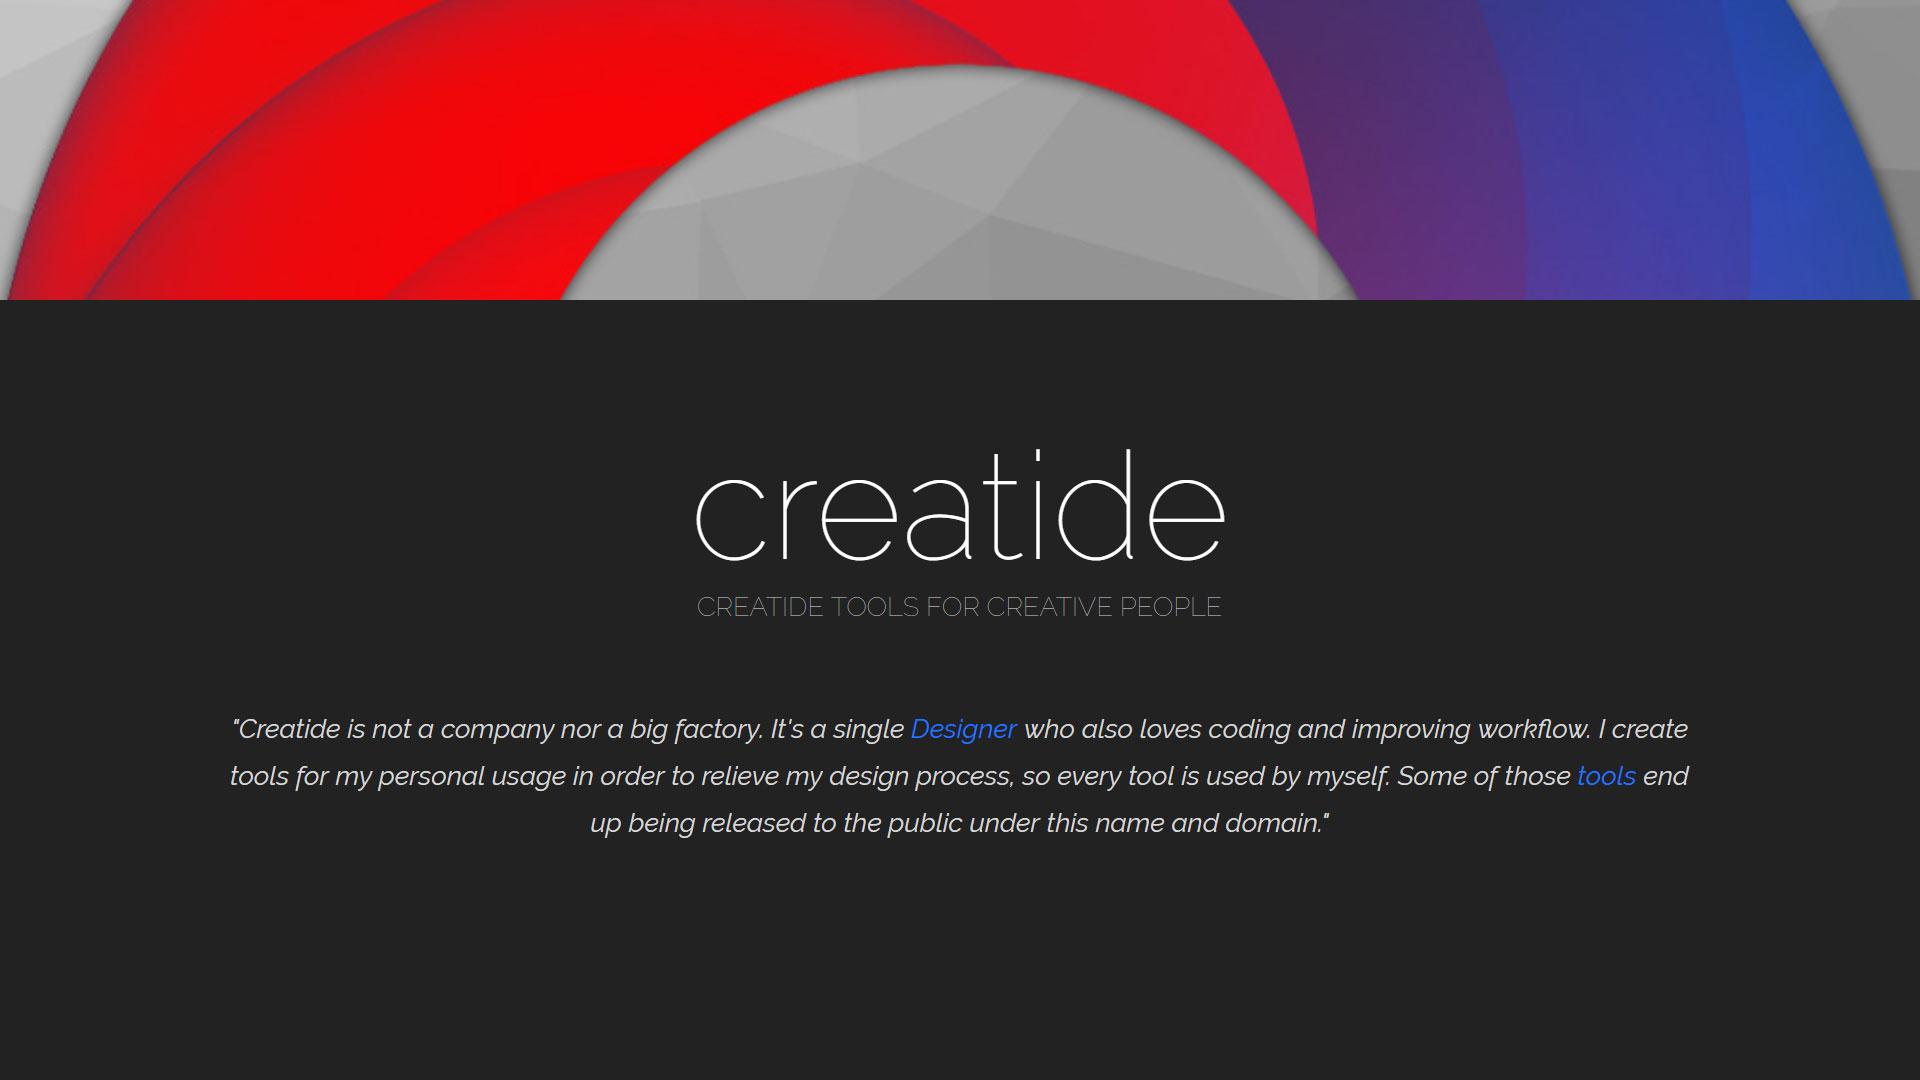 Creatide_Header_Info_01